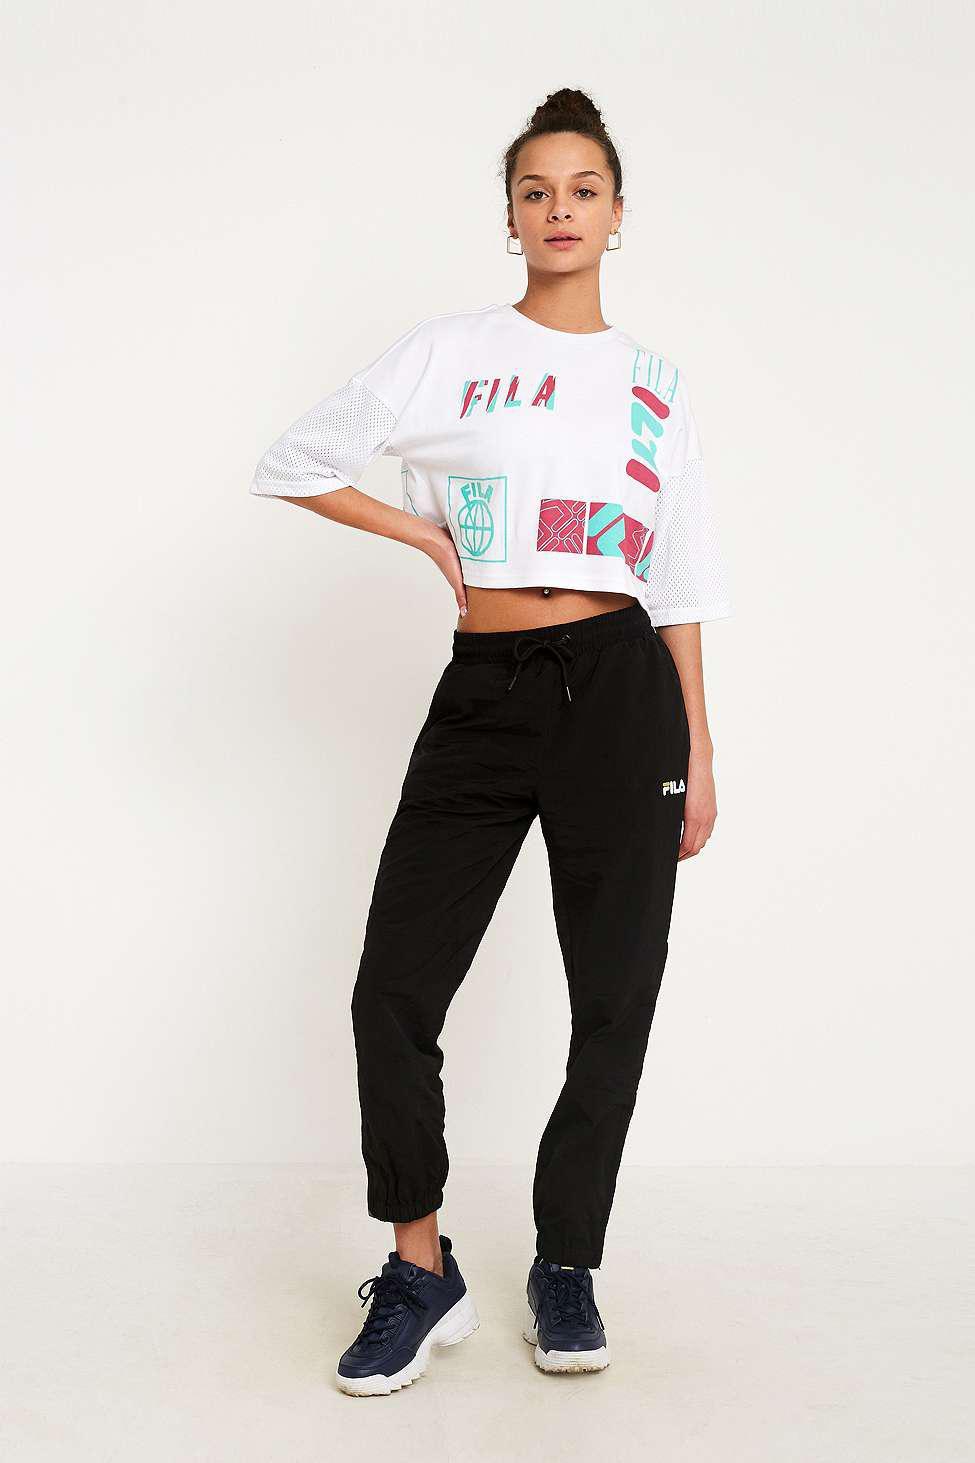 ecab73ca84 Fila Midouri Boxy T-shirt - Womens Xs in White - Lyst